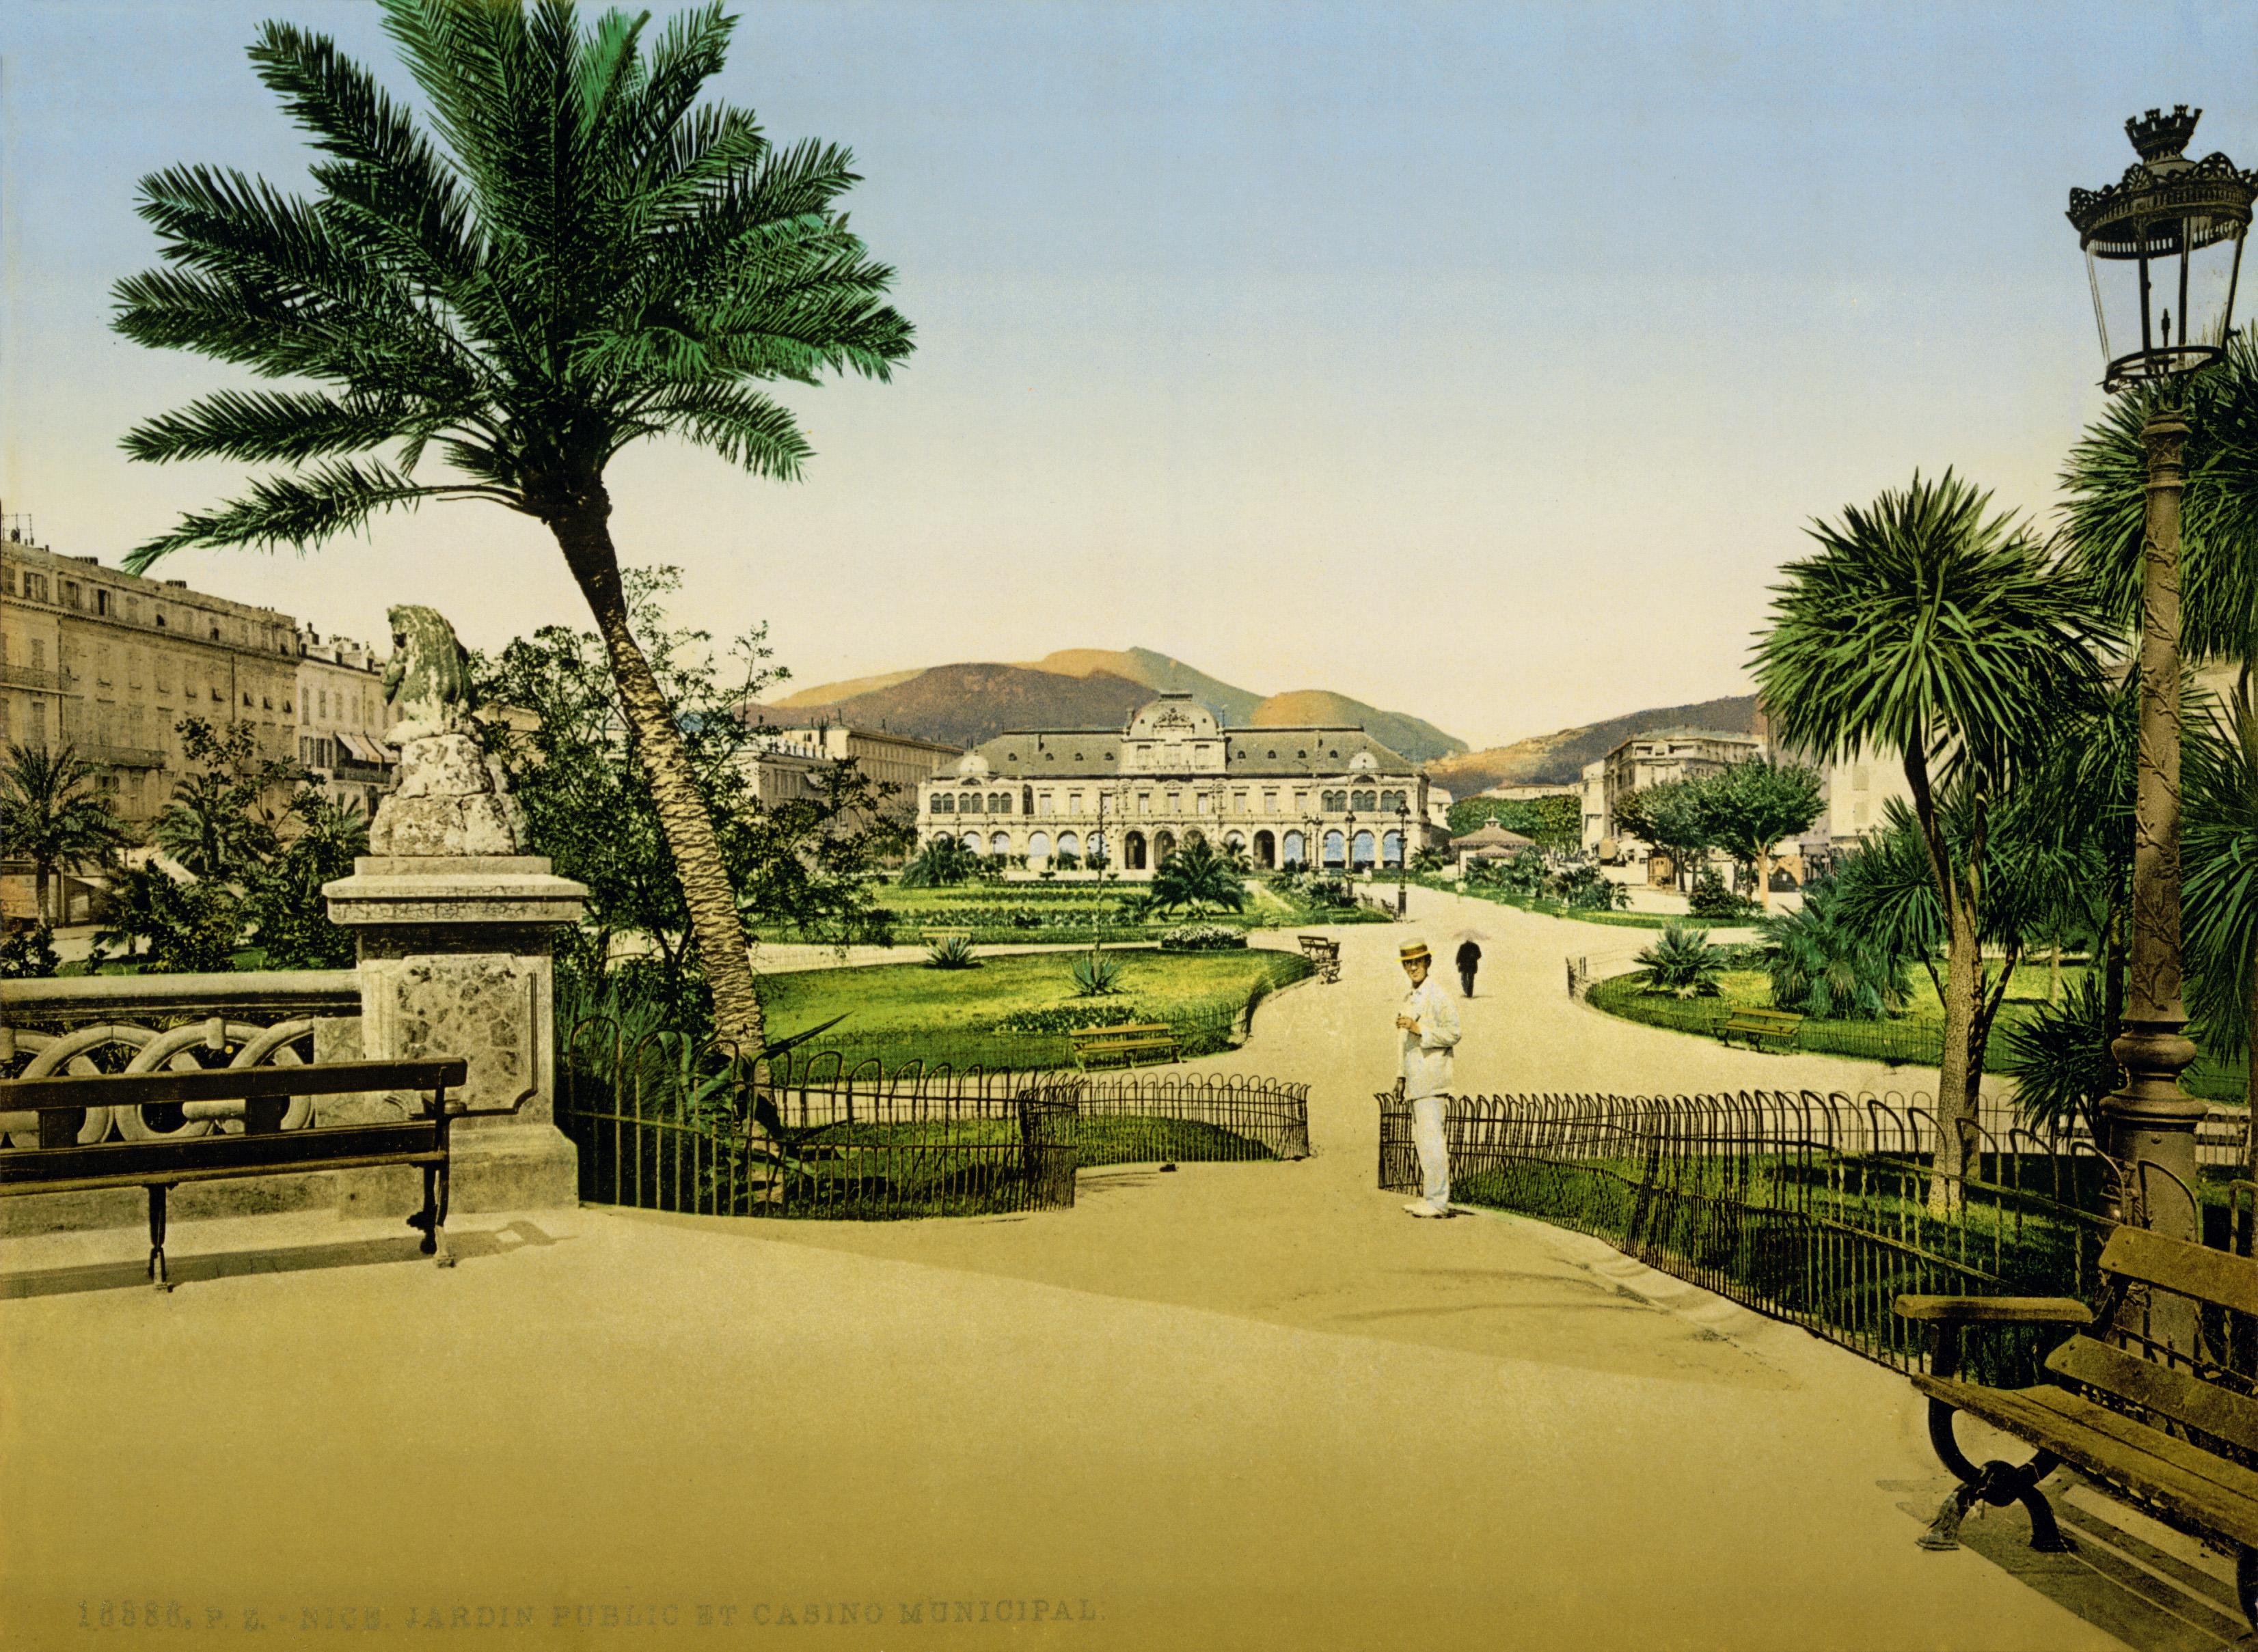 file flickr trialsanderrors public garden casino. Black Bedroom Furniture Sets. Home Design Ideas